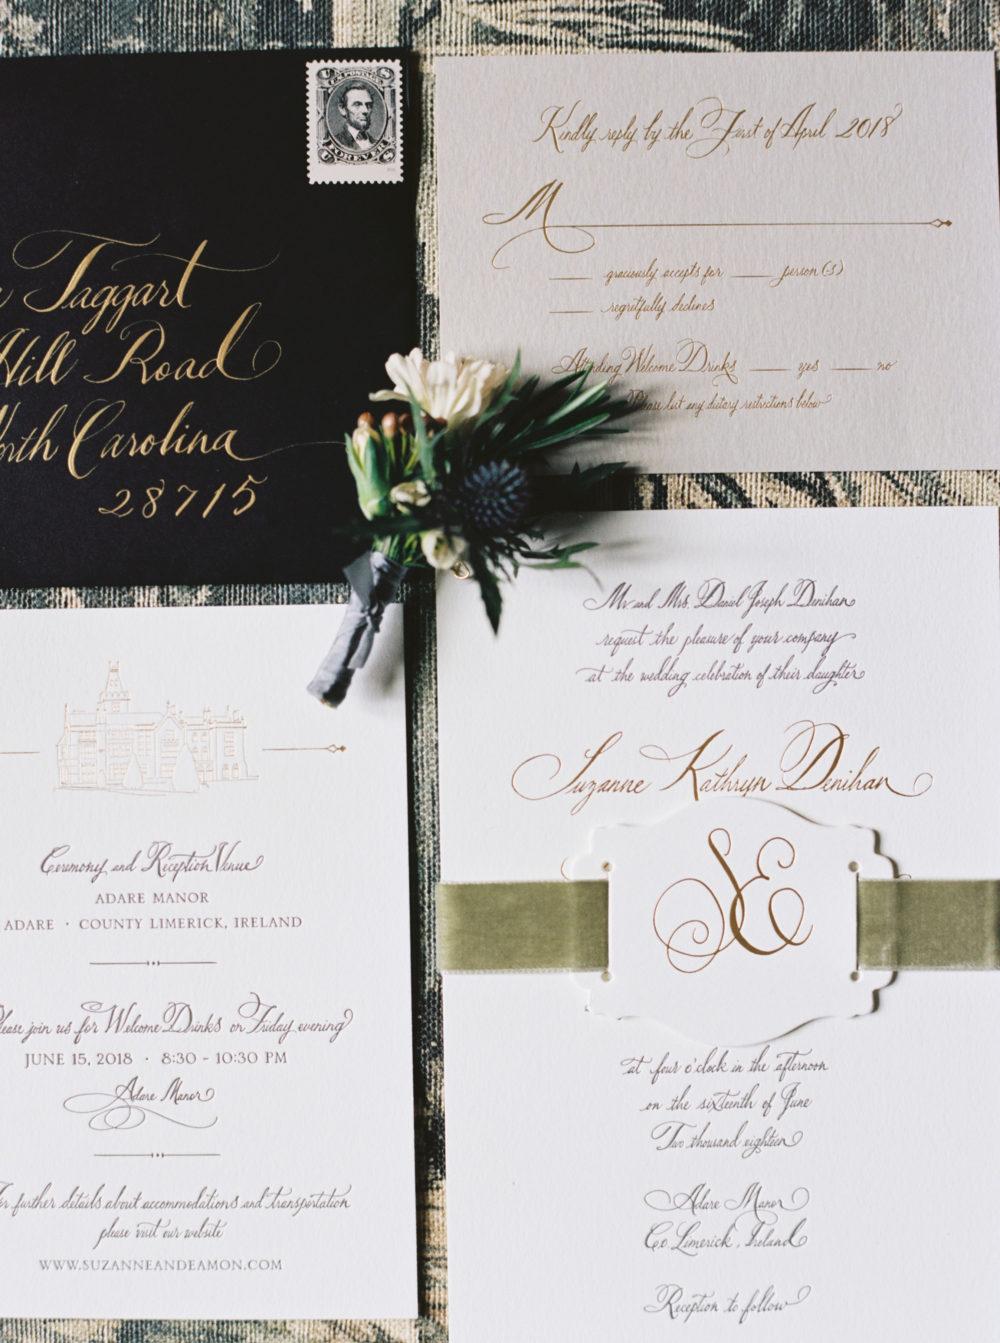 Wedding invitations Suzanne and Eamon